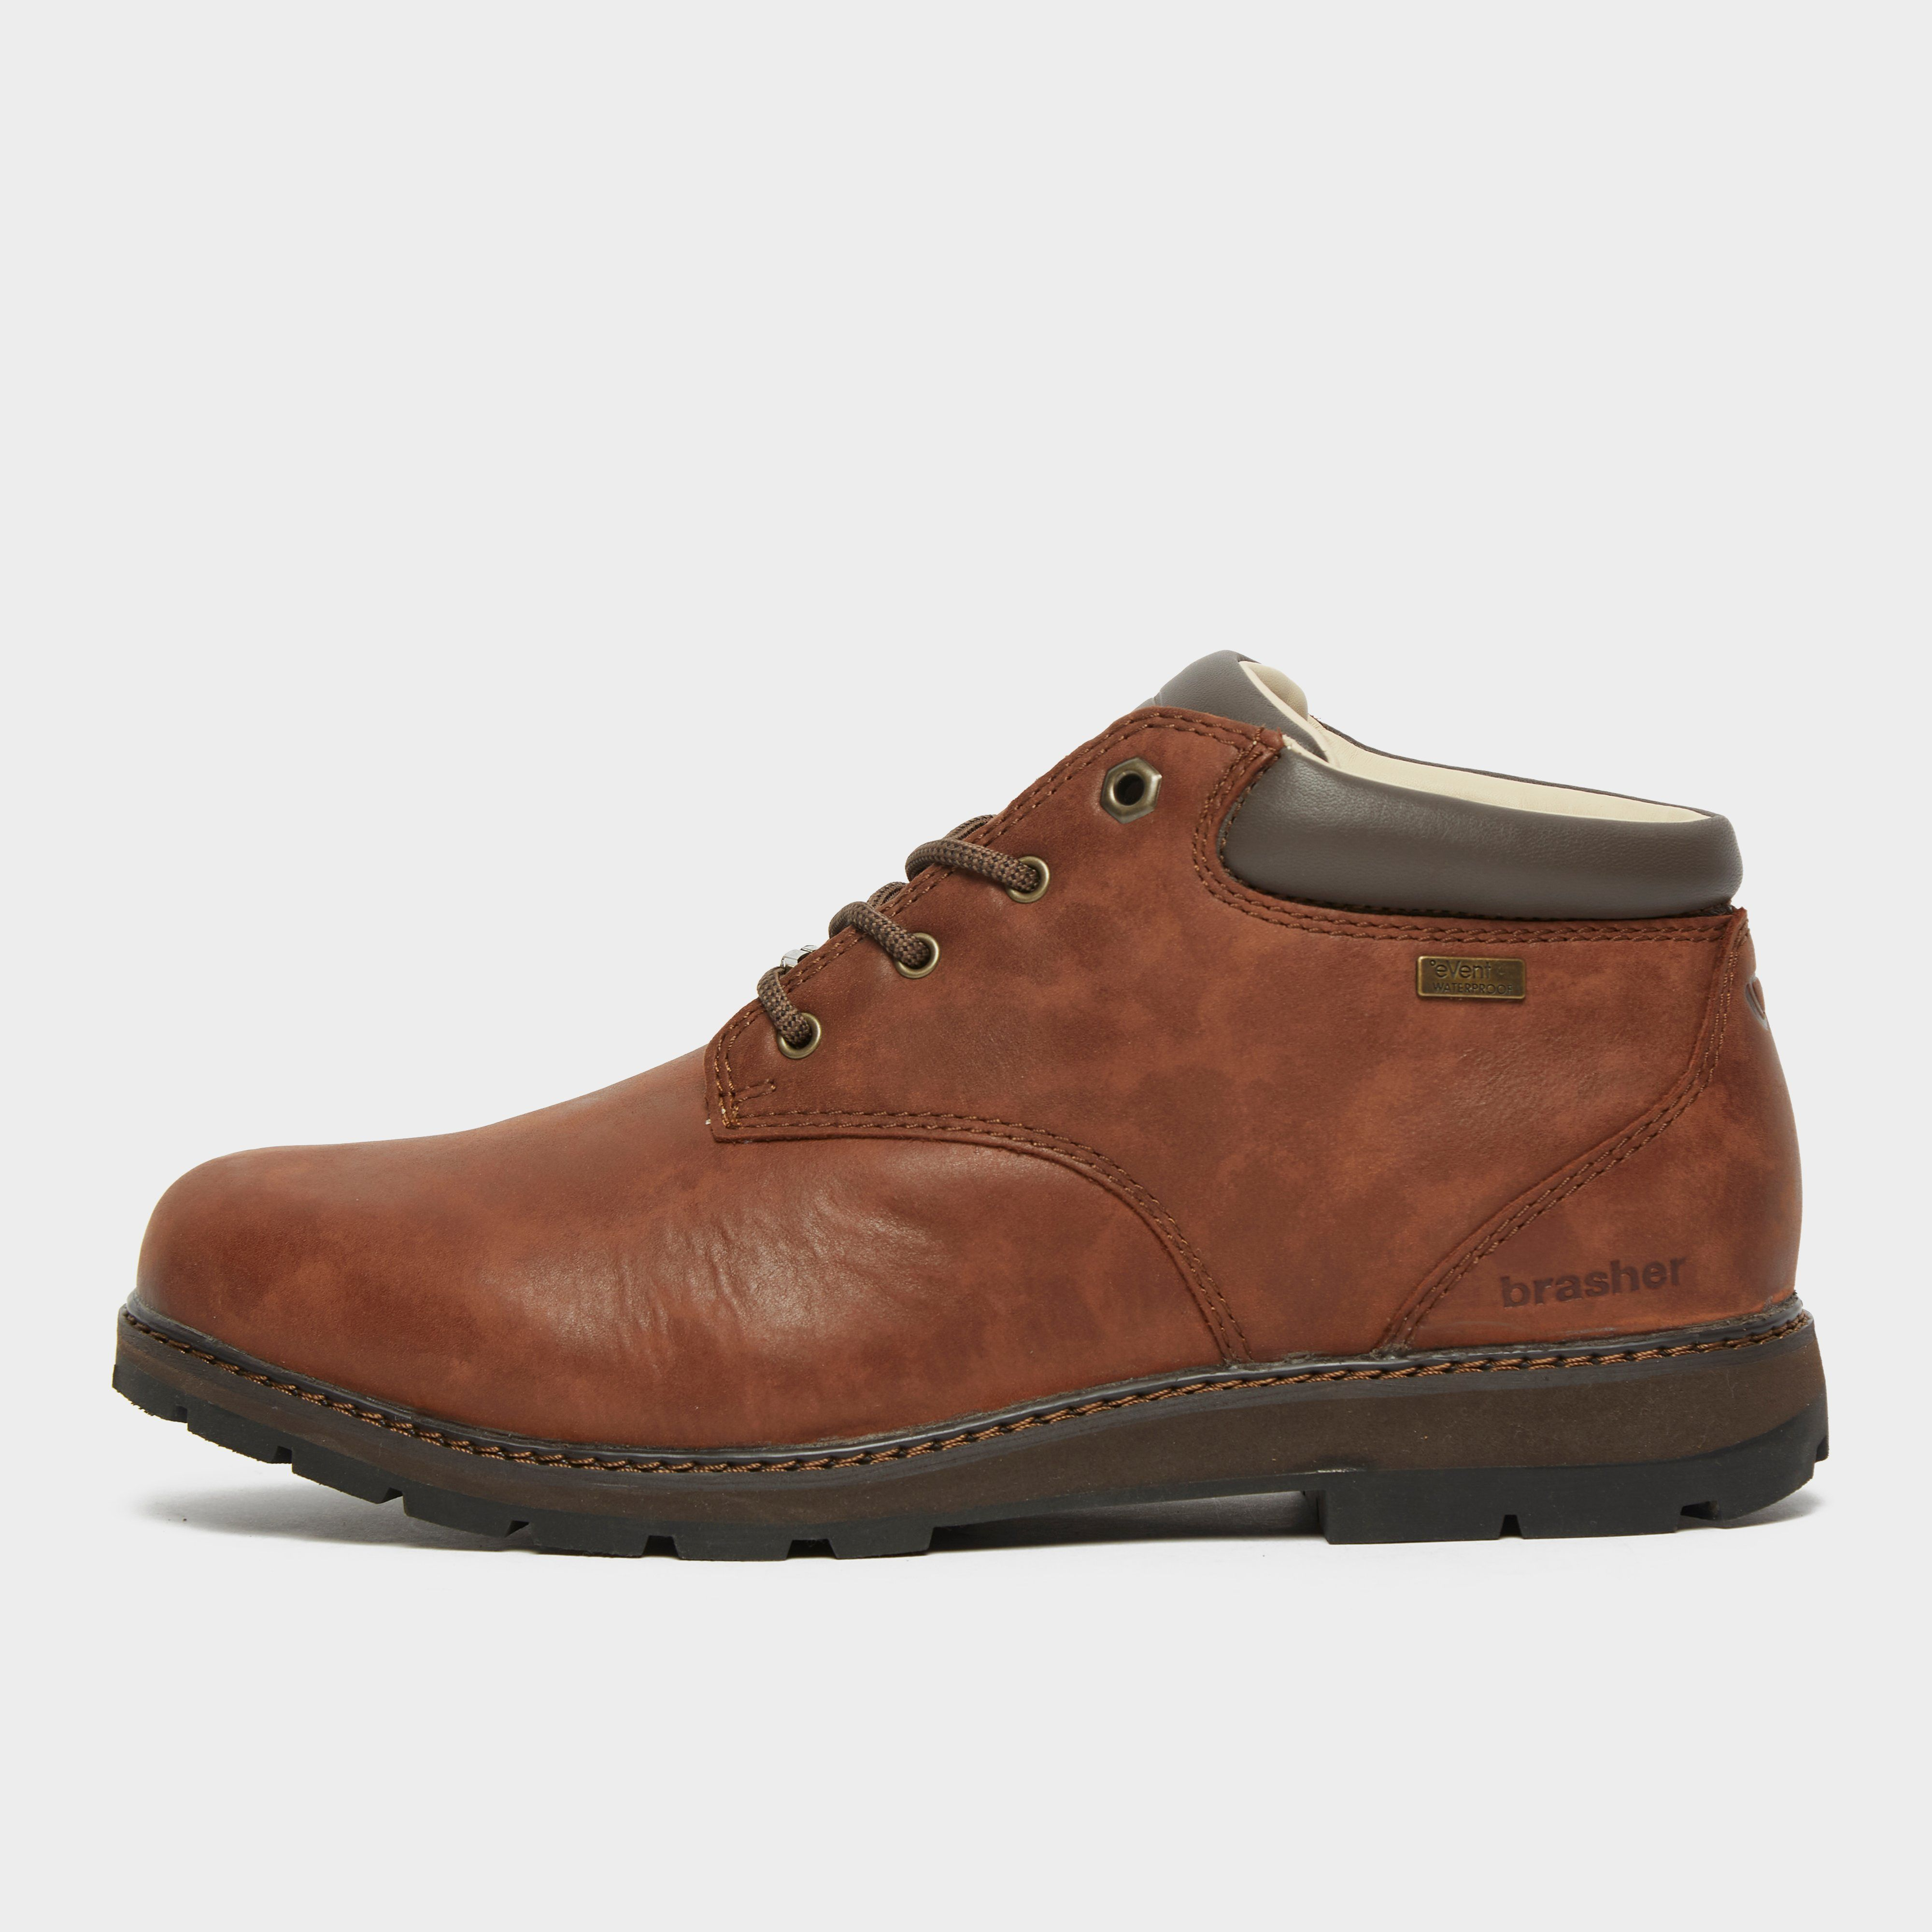 BRASHER Men's Country Traveller Walking Shoes